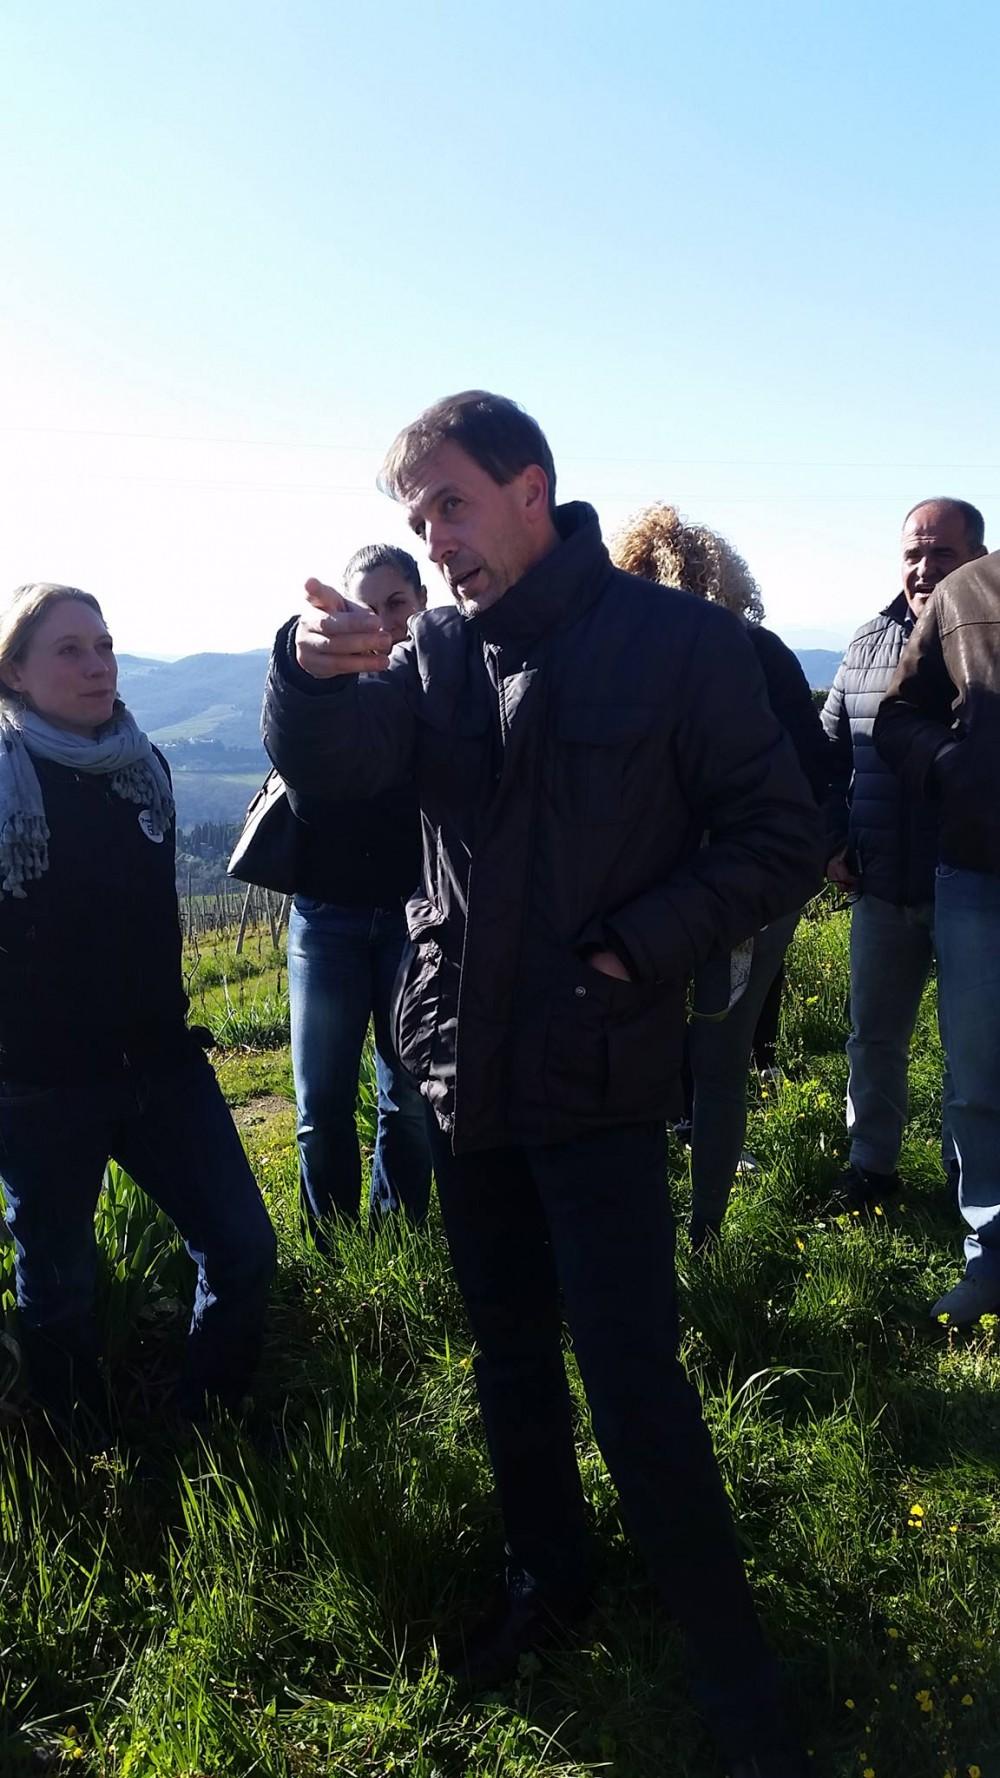 Lamole di Lamole - L'enologo Andrea Daldin